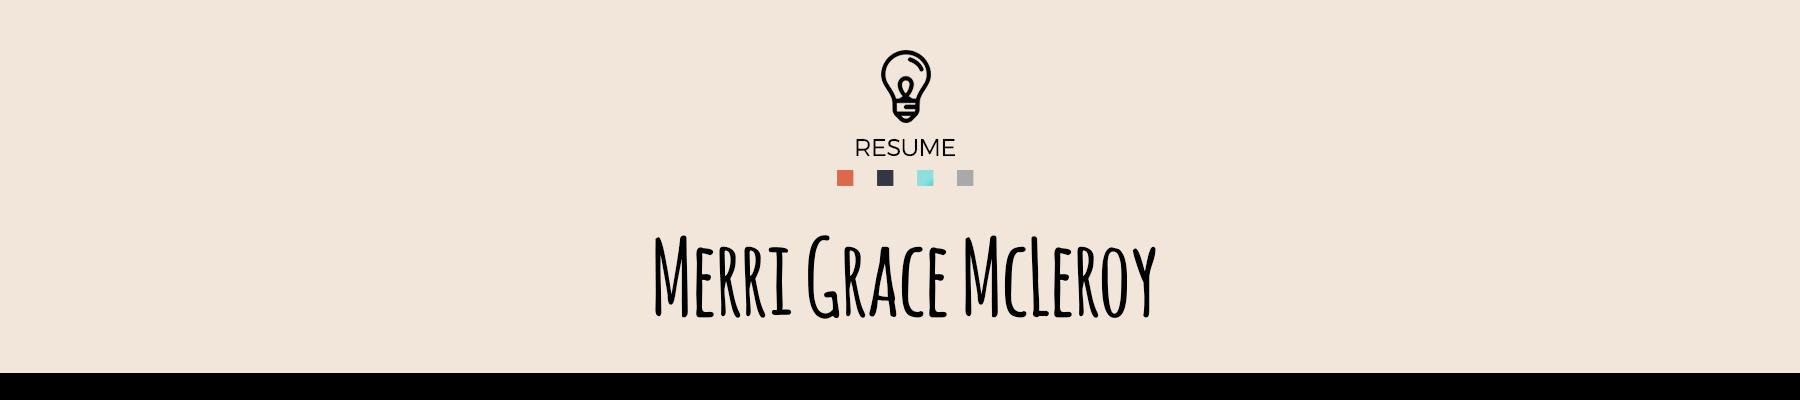 Merri Grace McLeroy